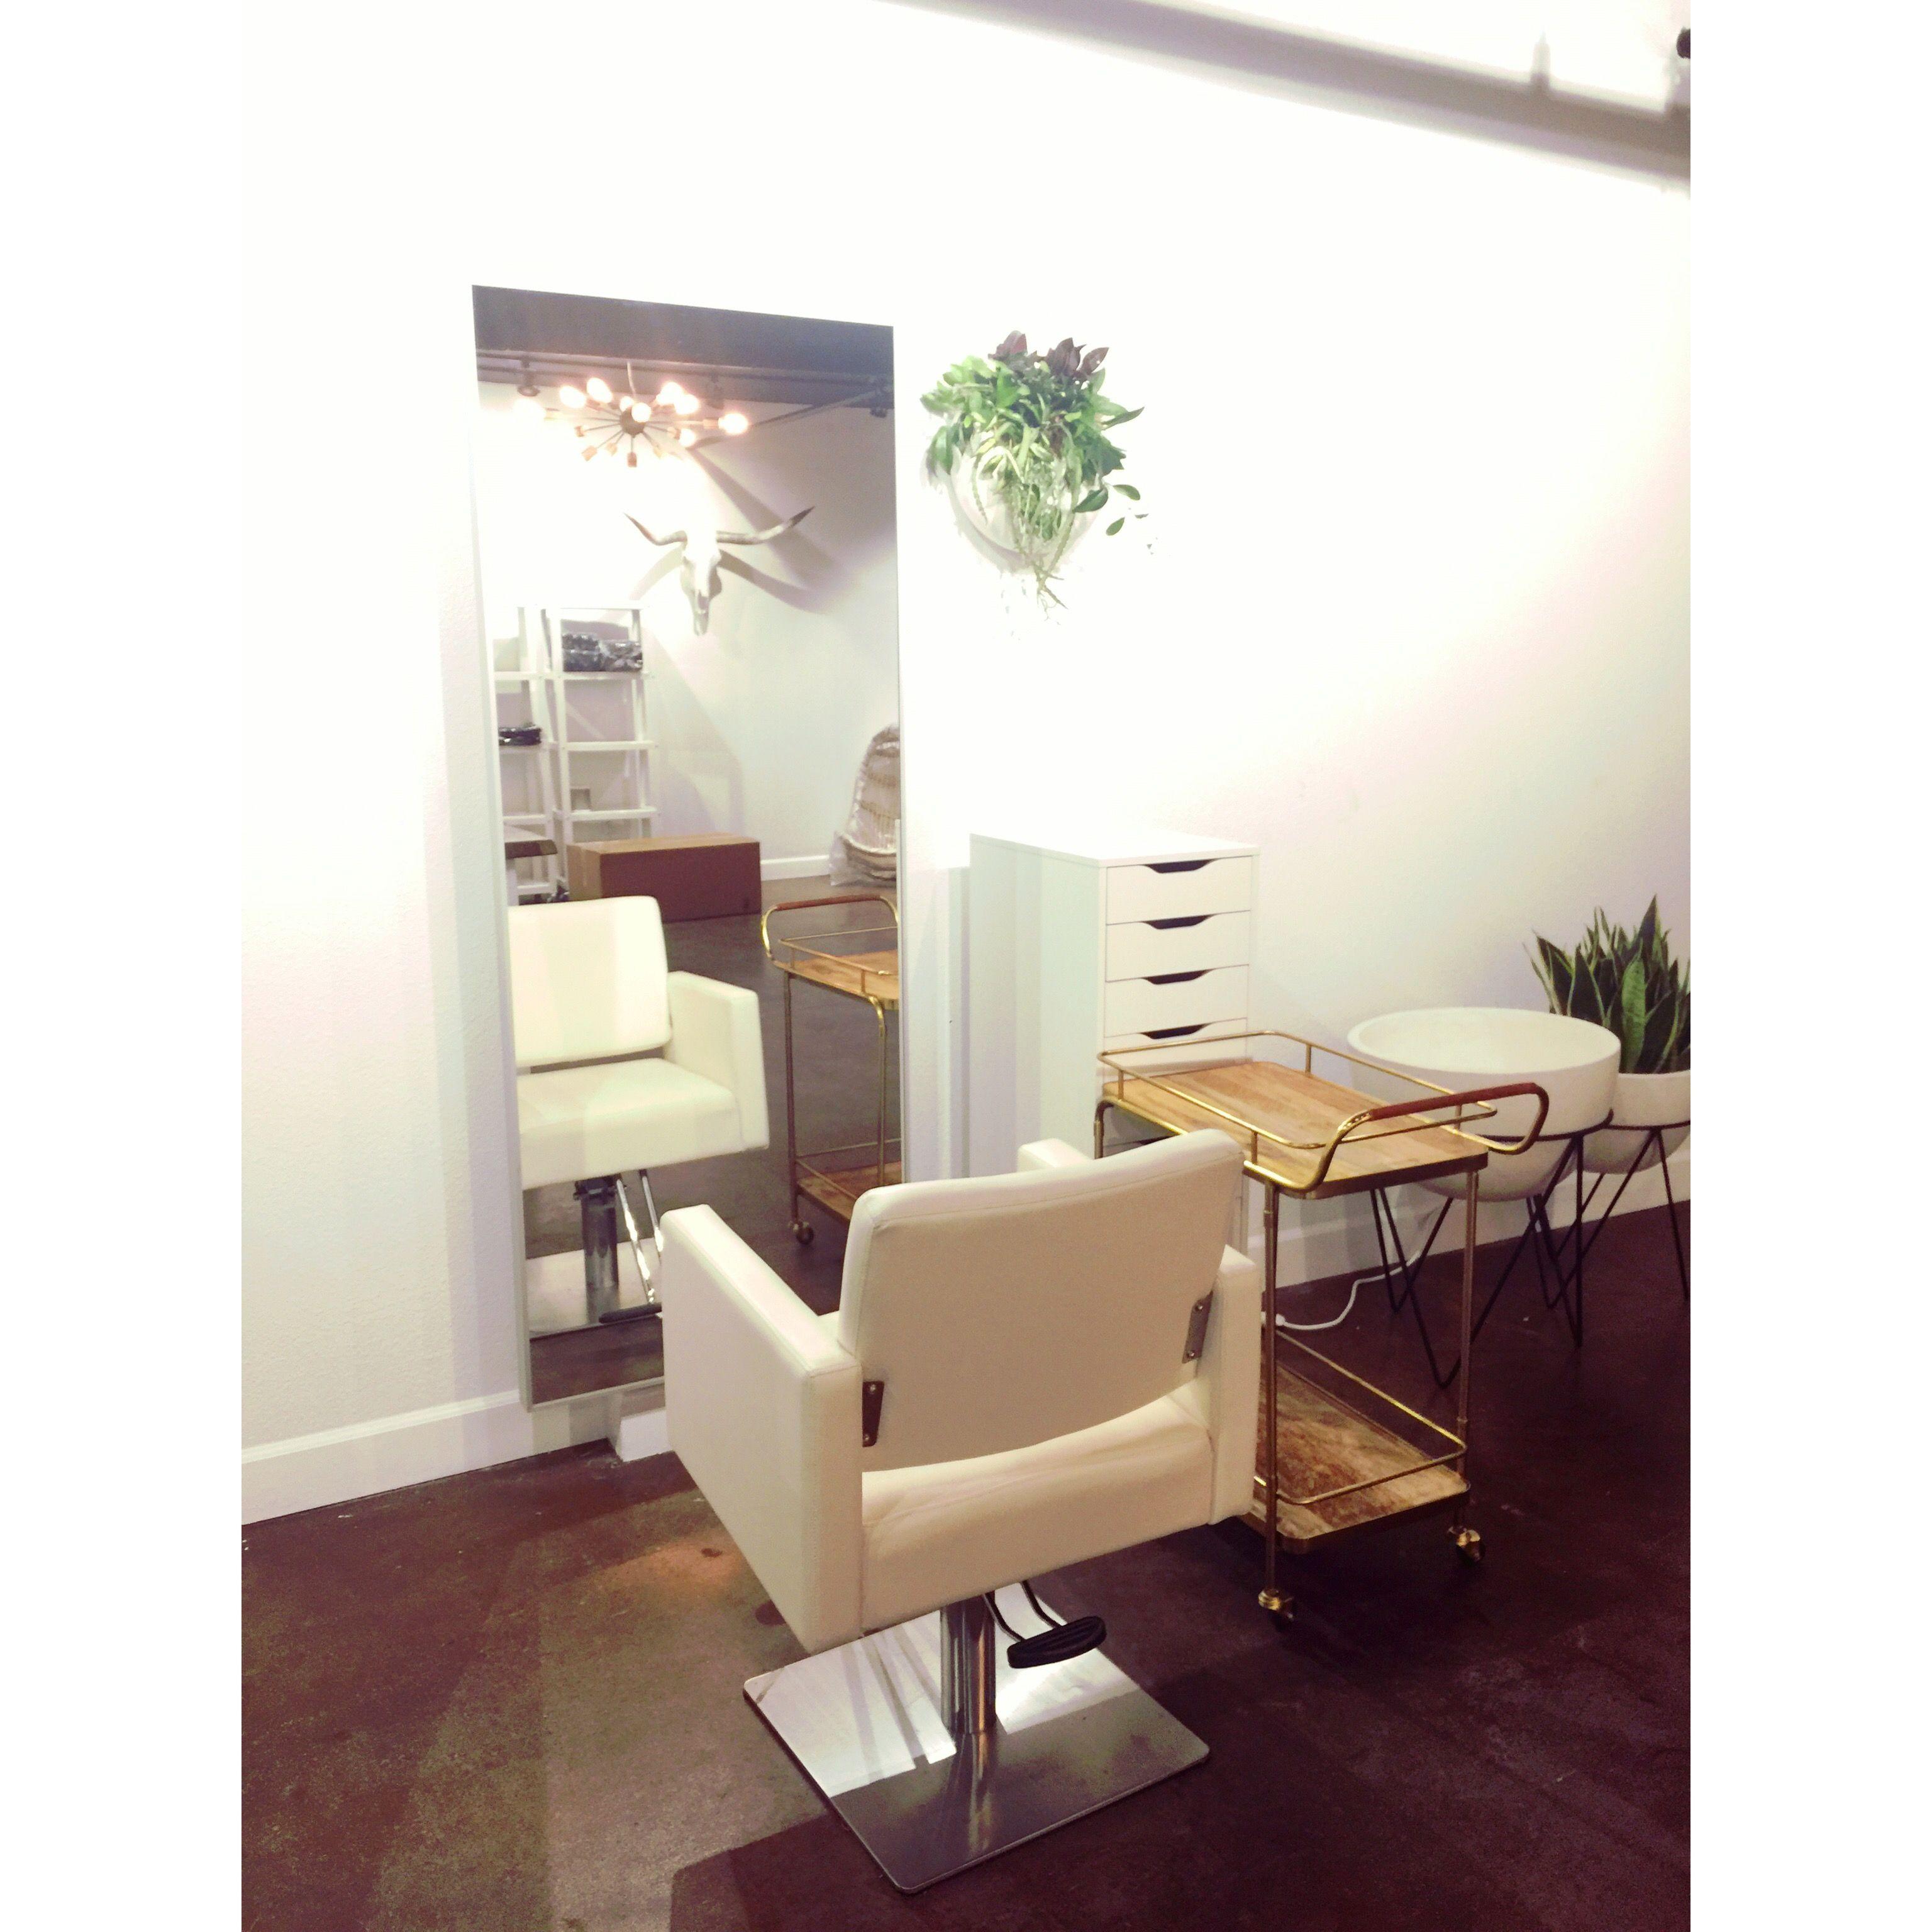 Waylon Salon Station White Salon Chair West Elm Jungelow La Jolla